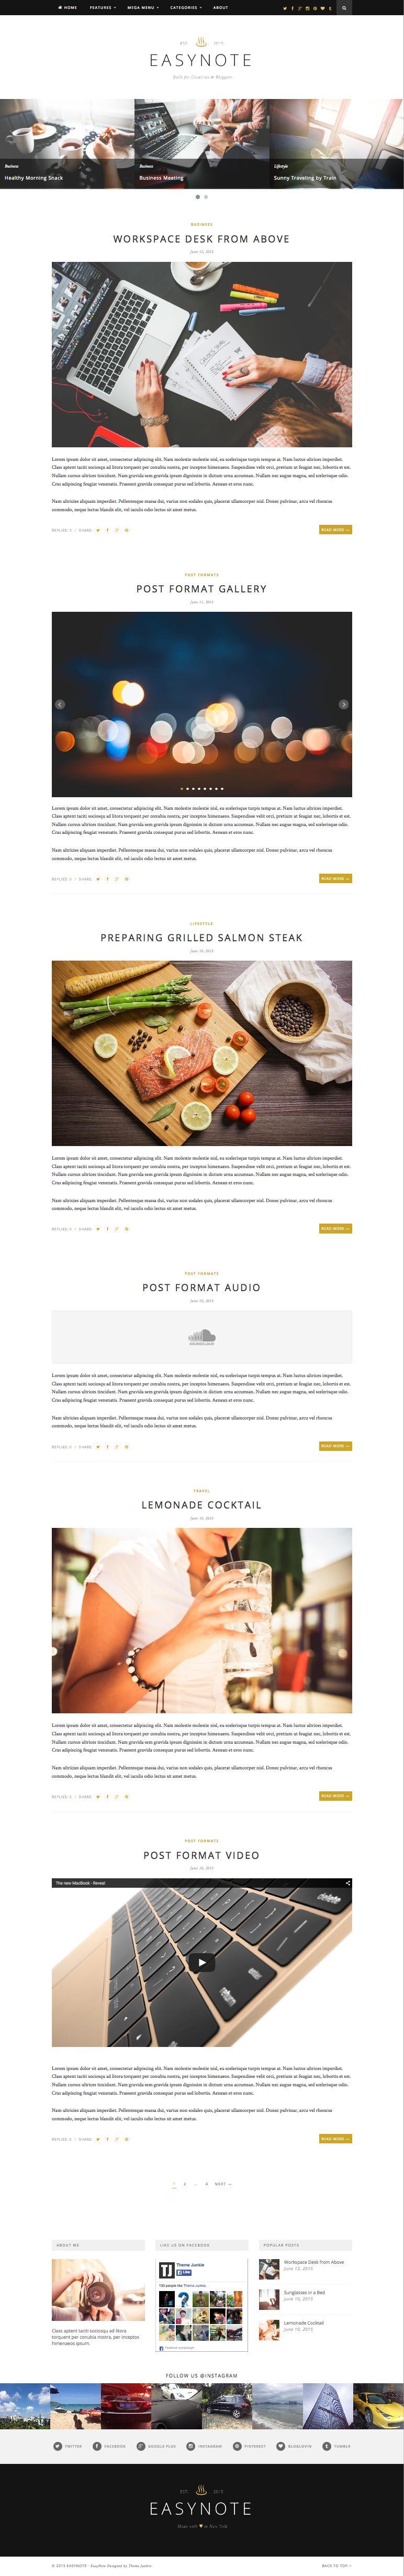 EasyNote SEO Ready WordPress News Blog Theme